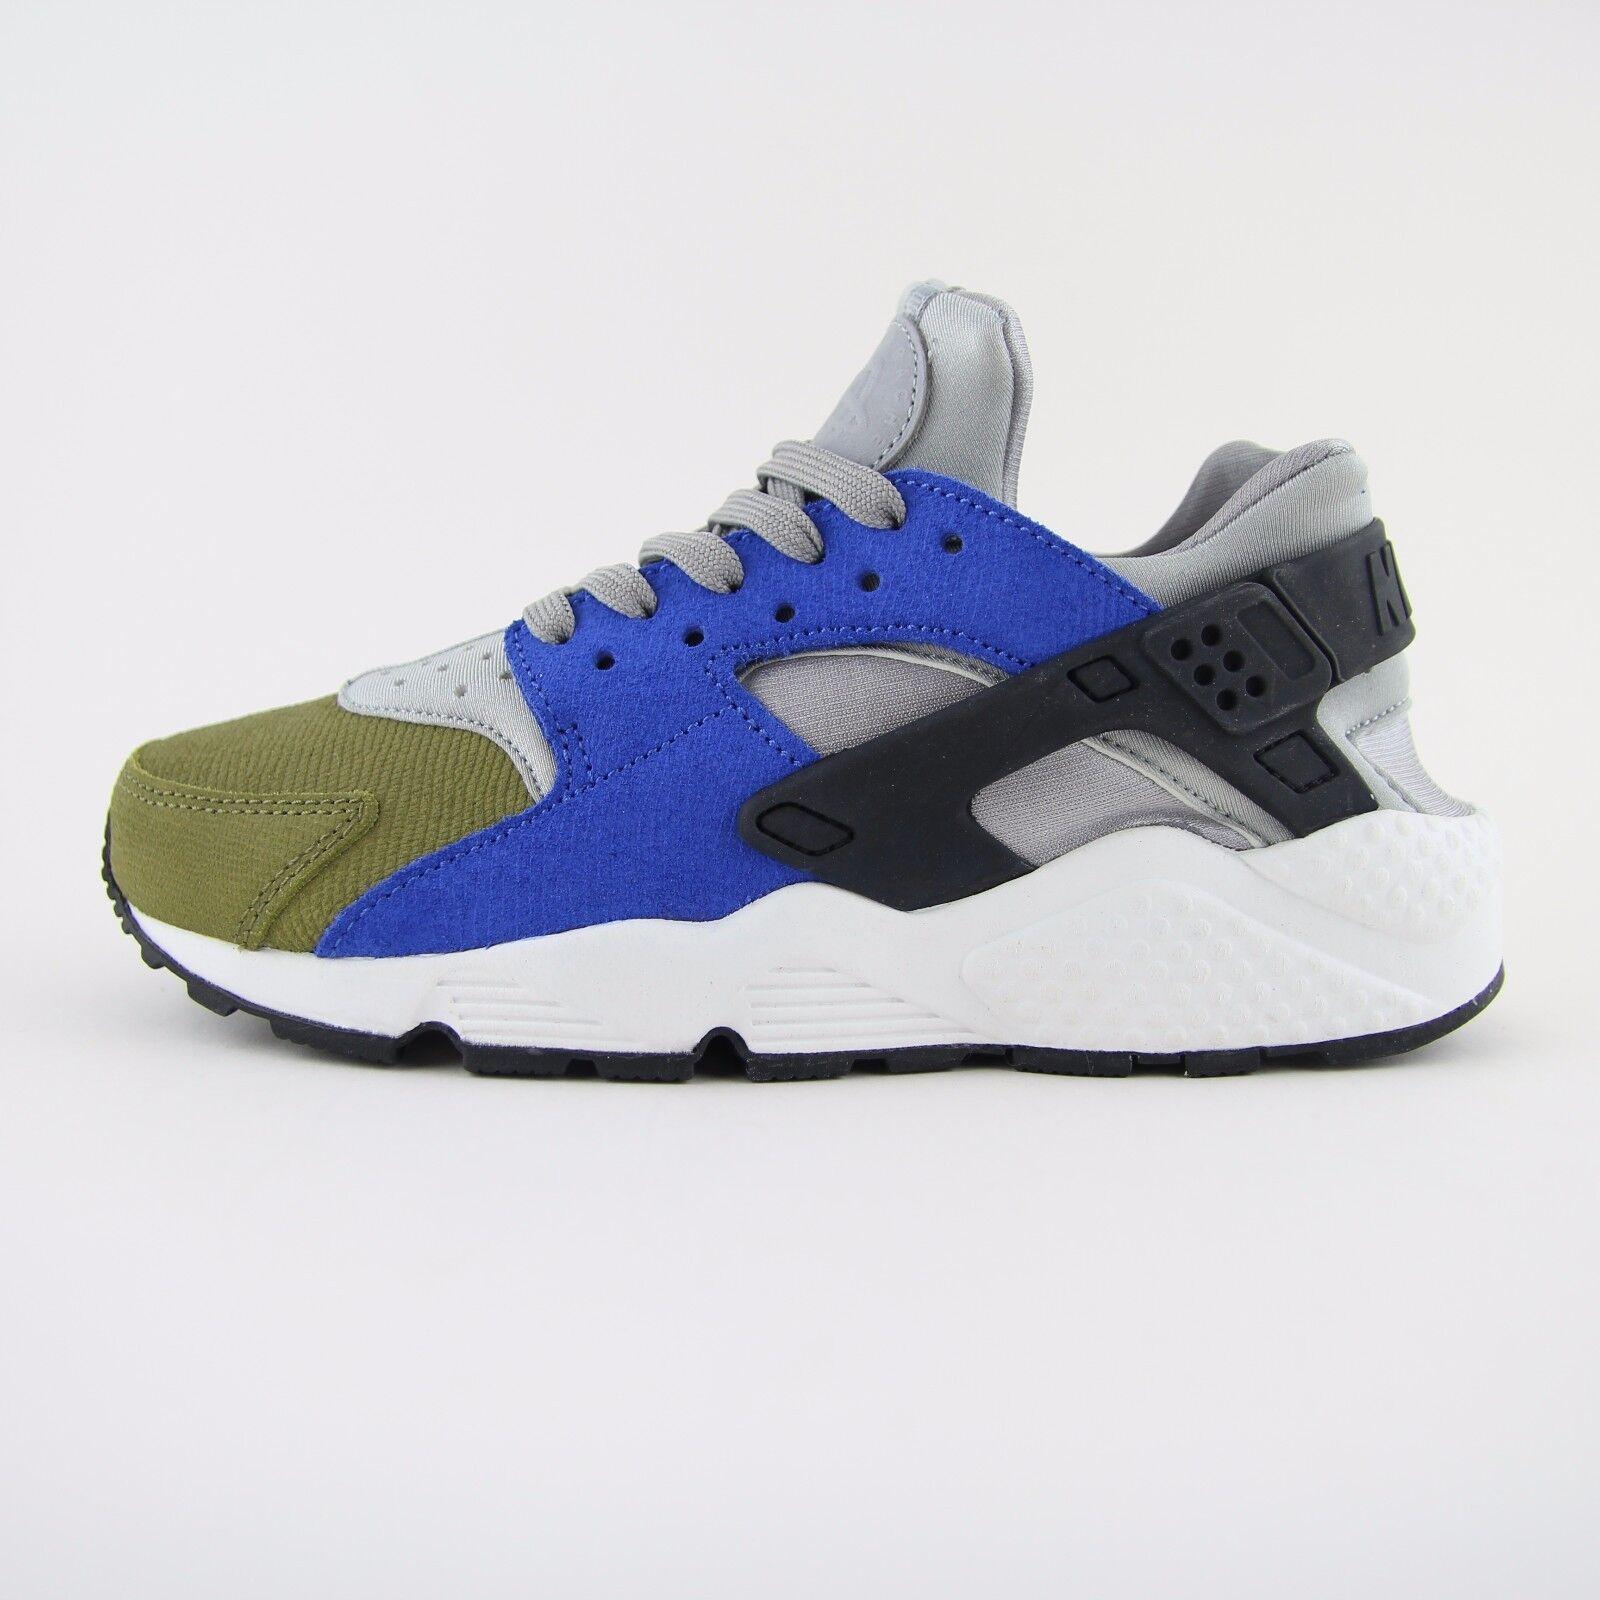 NEU Damenschuhe Kids Nike Air Huarache Run Premium Blau Trainers UK 4.5 BN 683818 007